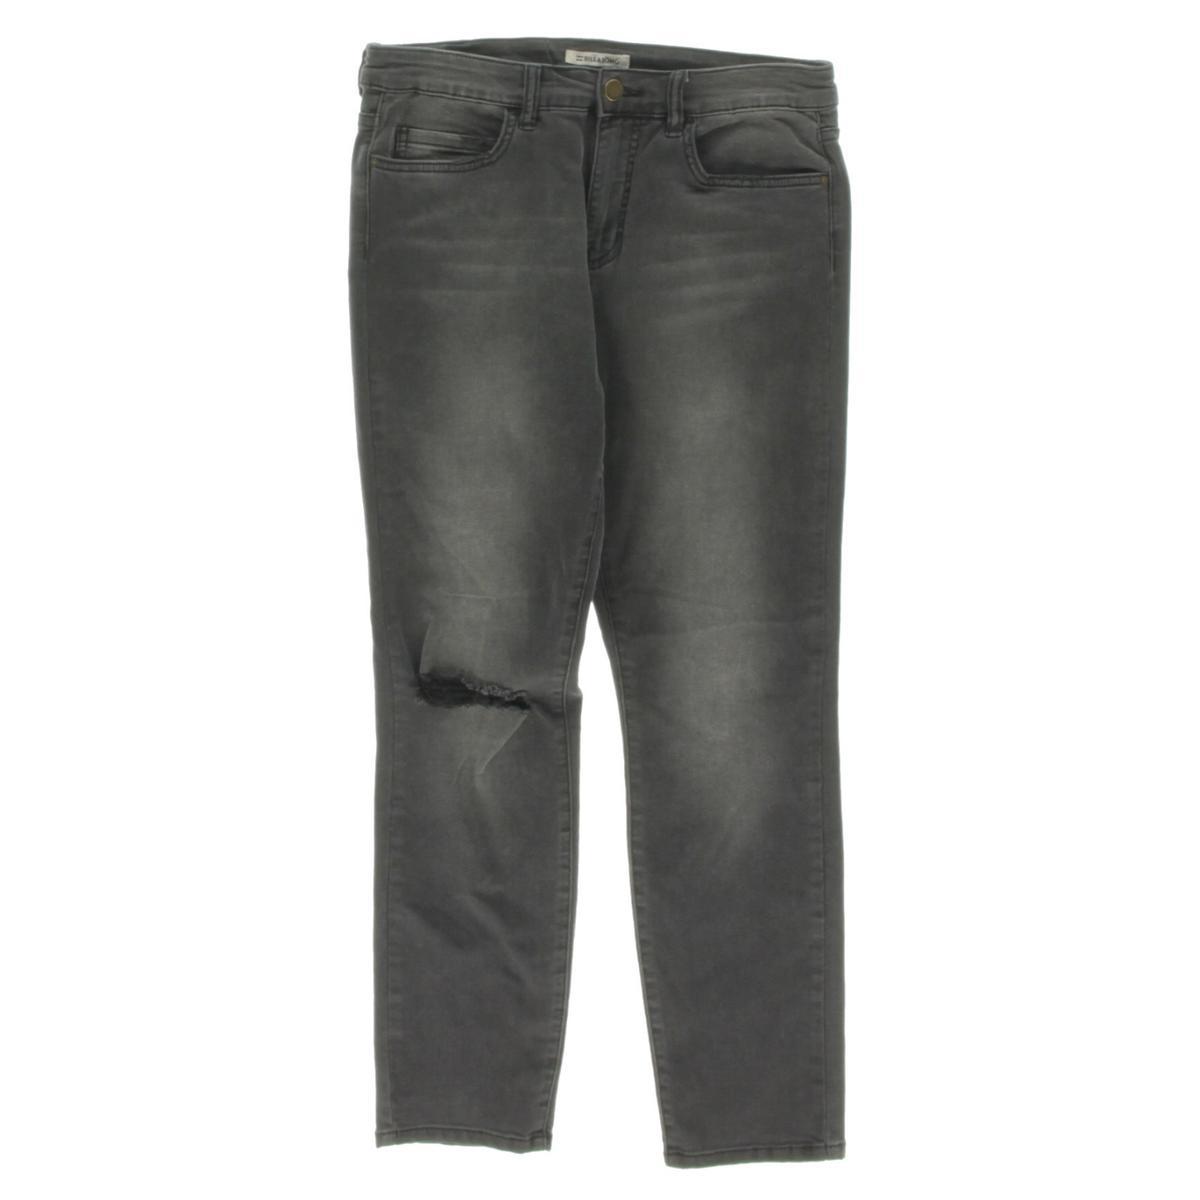 Billabong Womens Hot Mama Distressed Mid-Rise Skinny Jeans